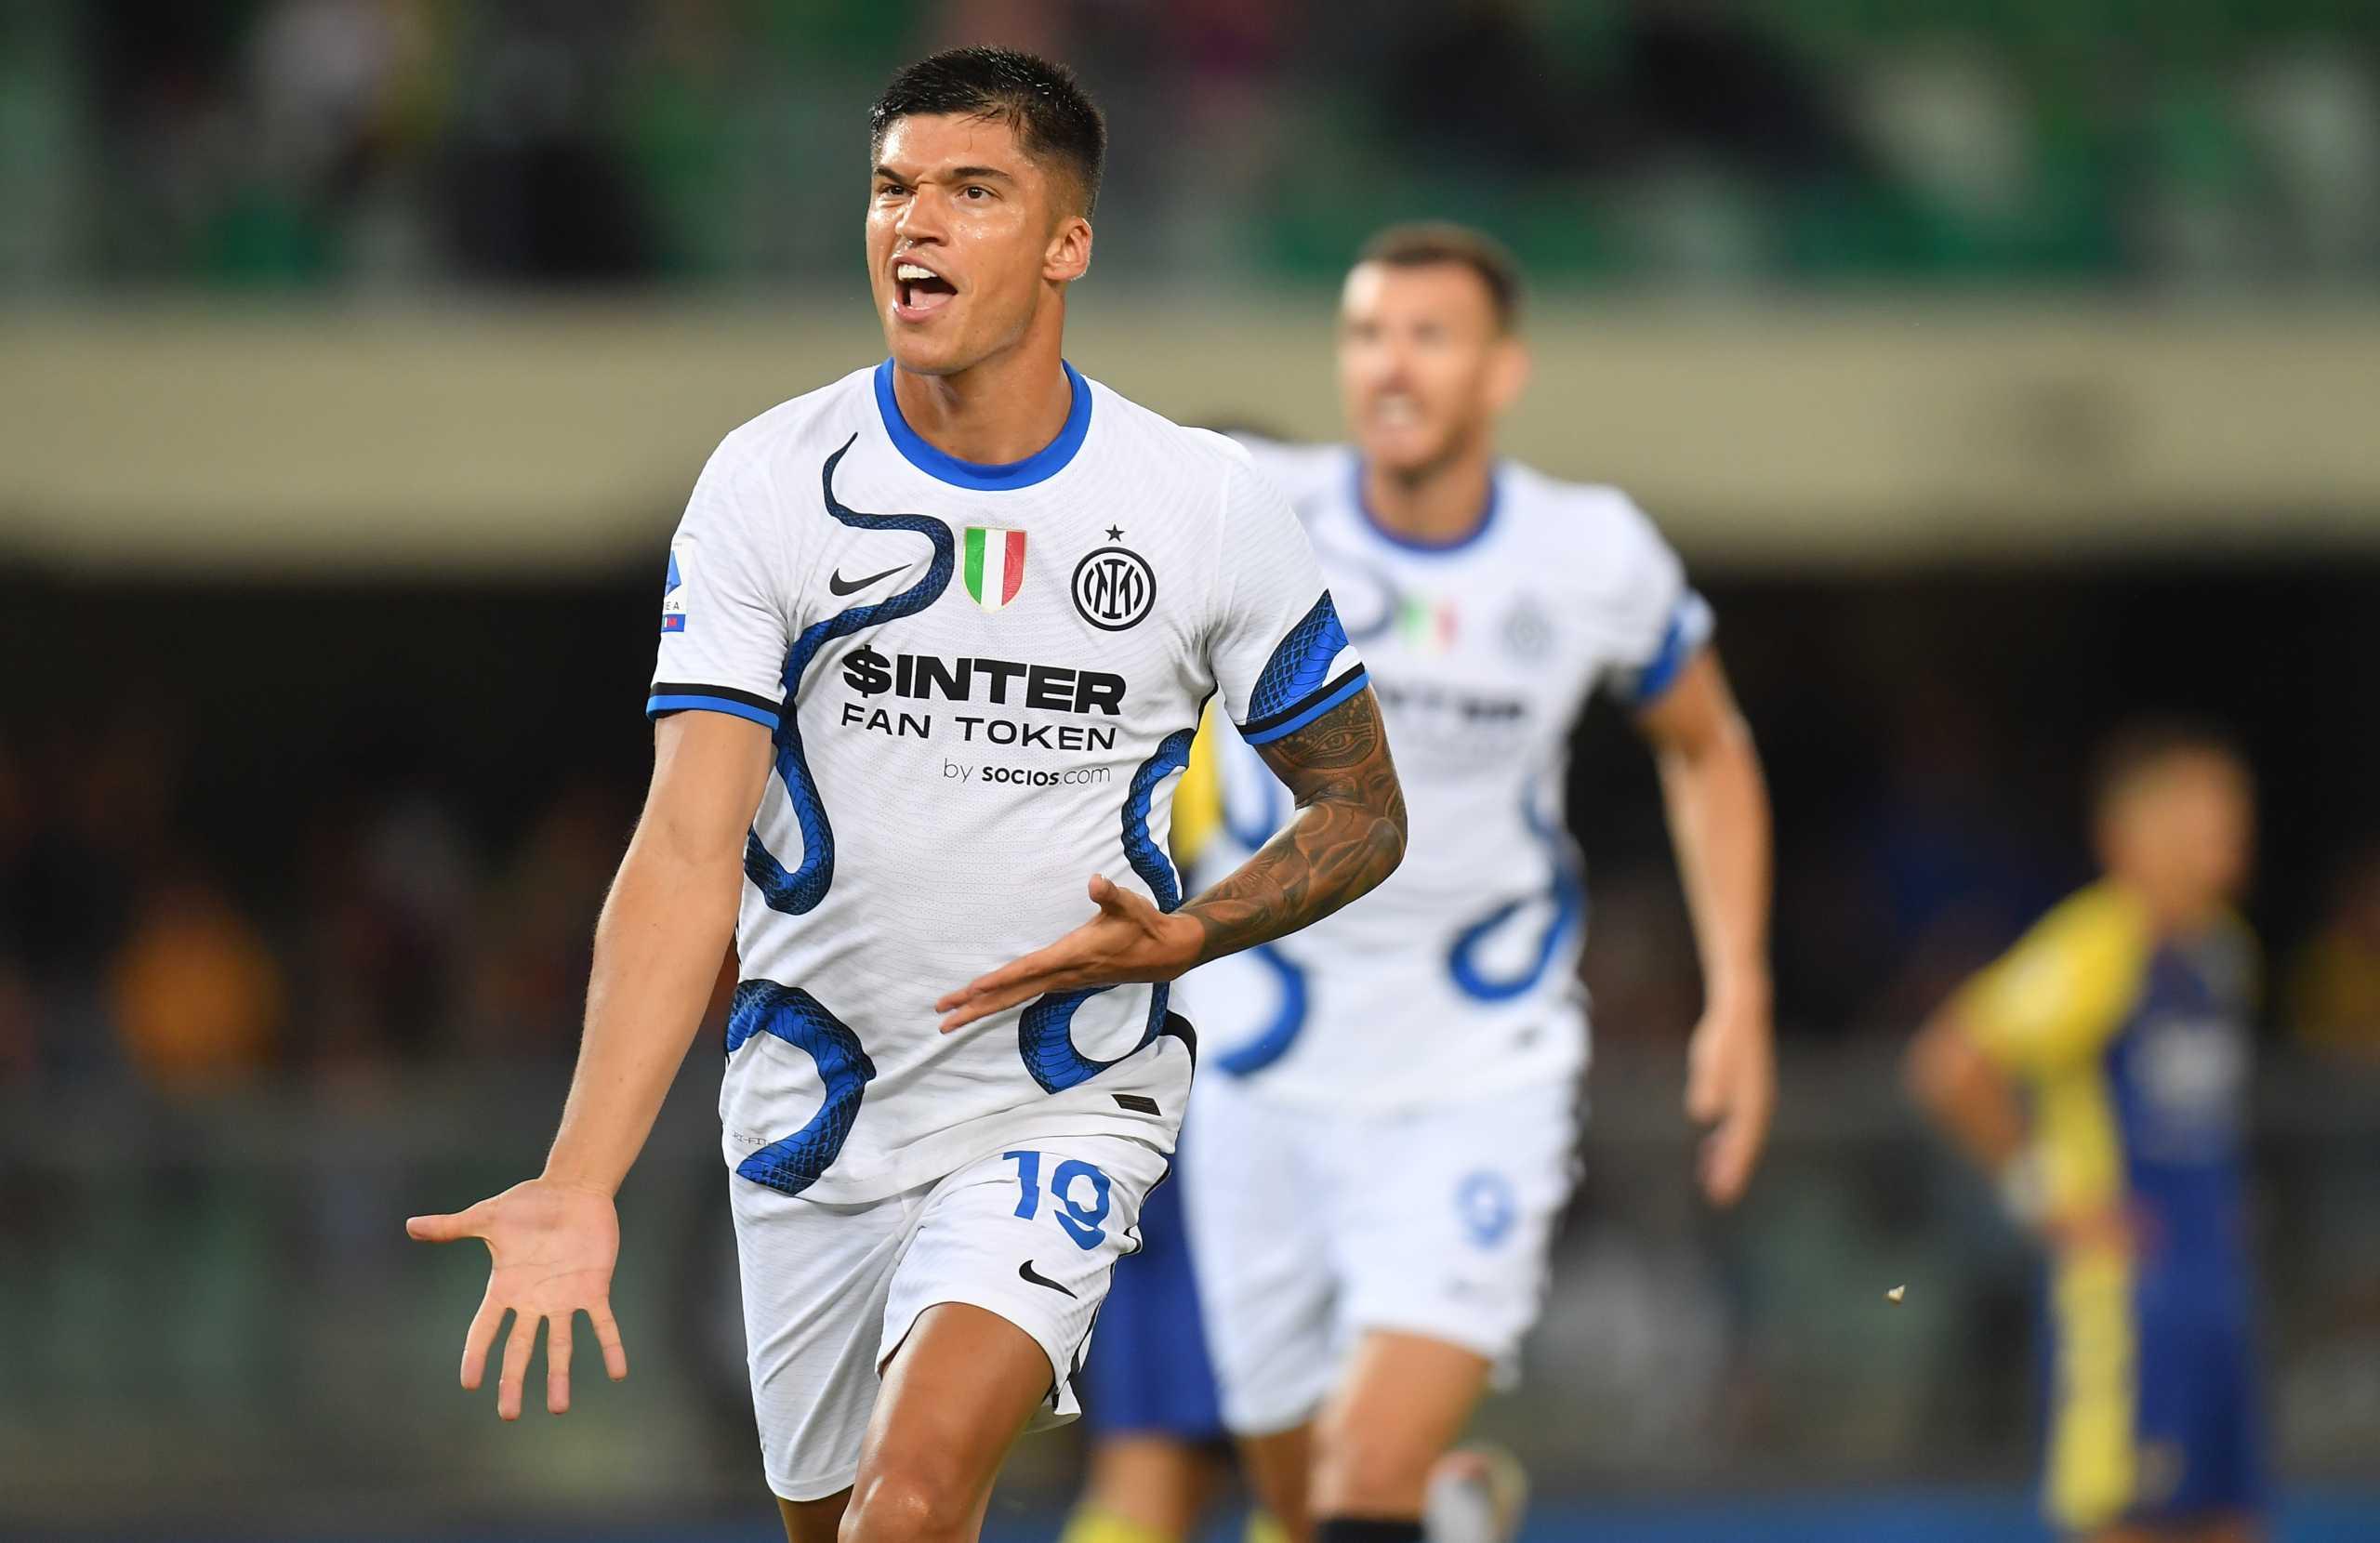 Serie A: Διπλό με ανατροπή για την Ίντερ – Τρομερό ντεμπούτο από τον Κορέα